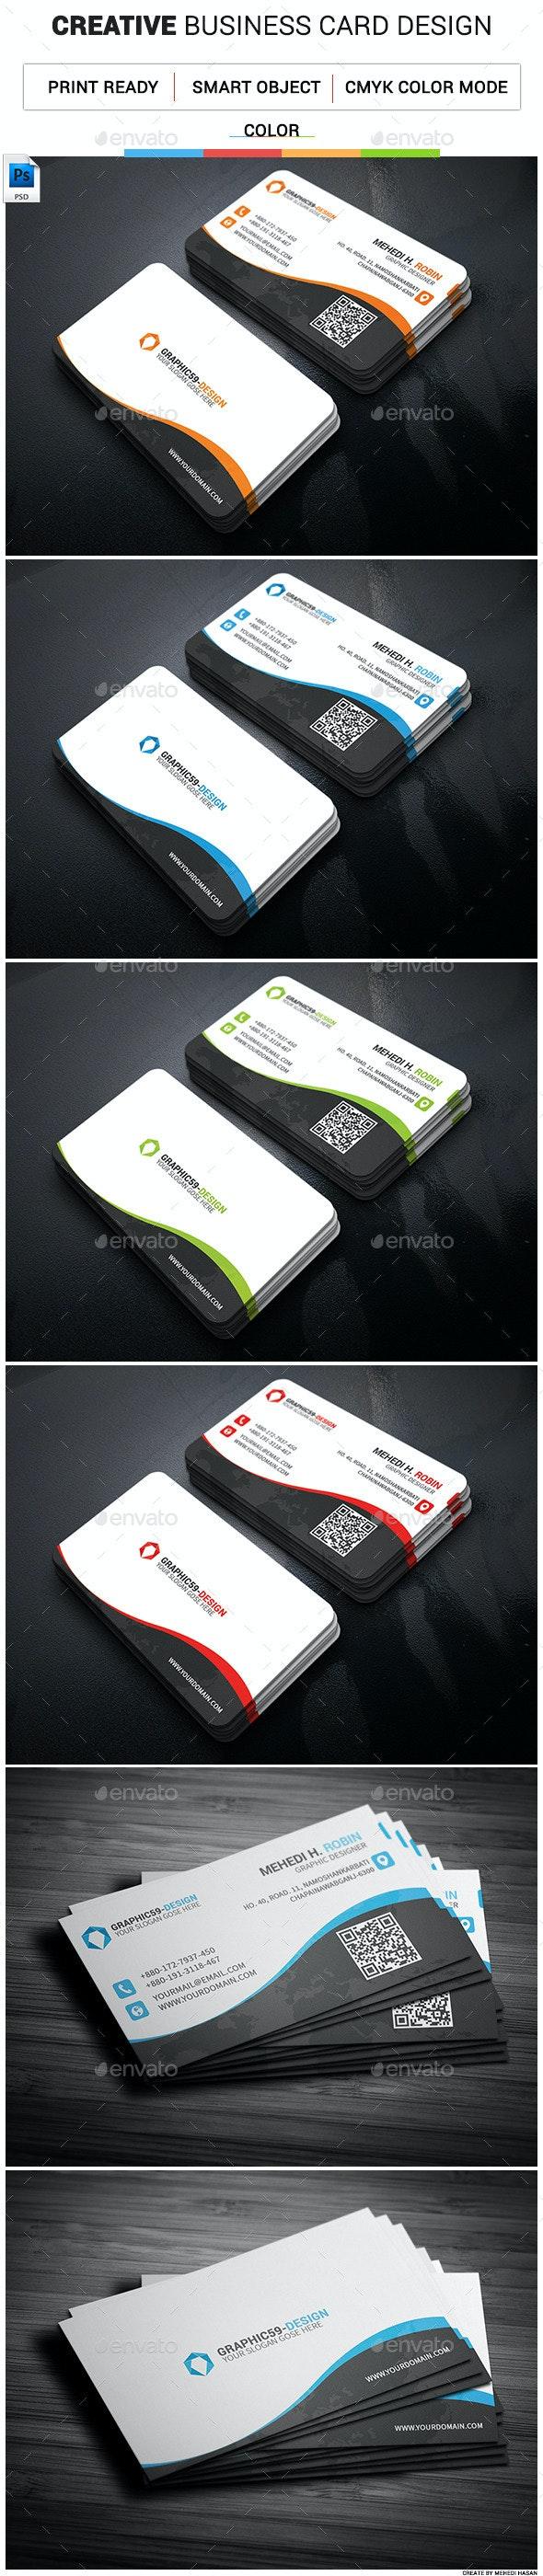 Creative Business Card 08 - Creative Business Cards